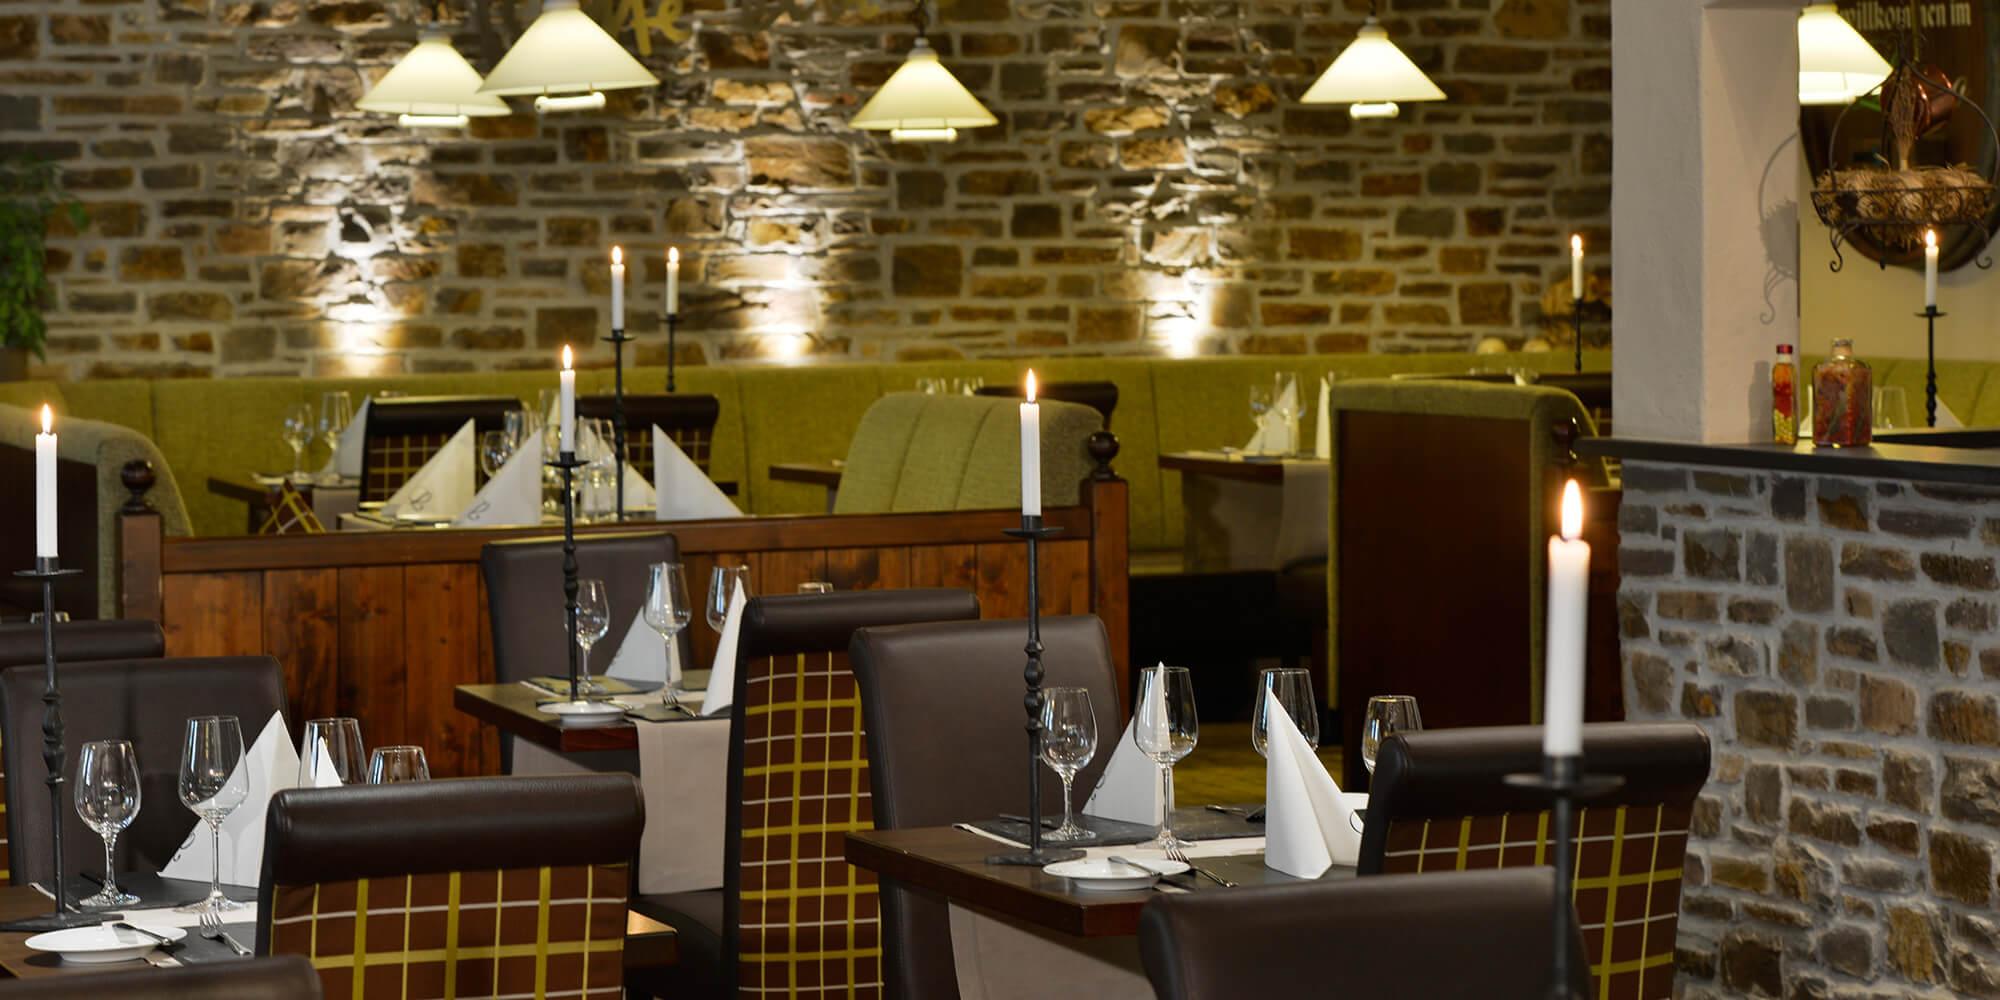 GranCanariaFoto-Hotel-Restaurant-Dirk-Holst-DHSTUDIO-393